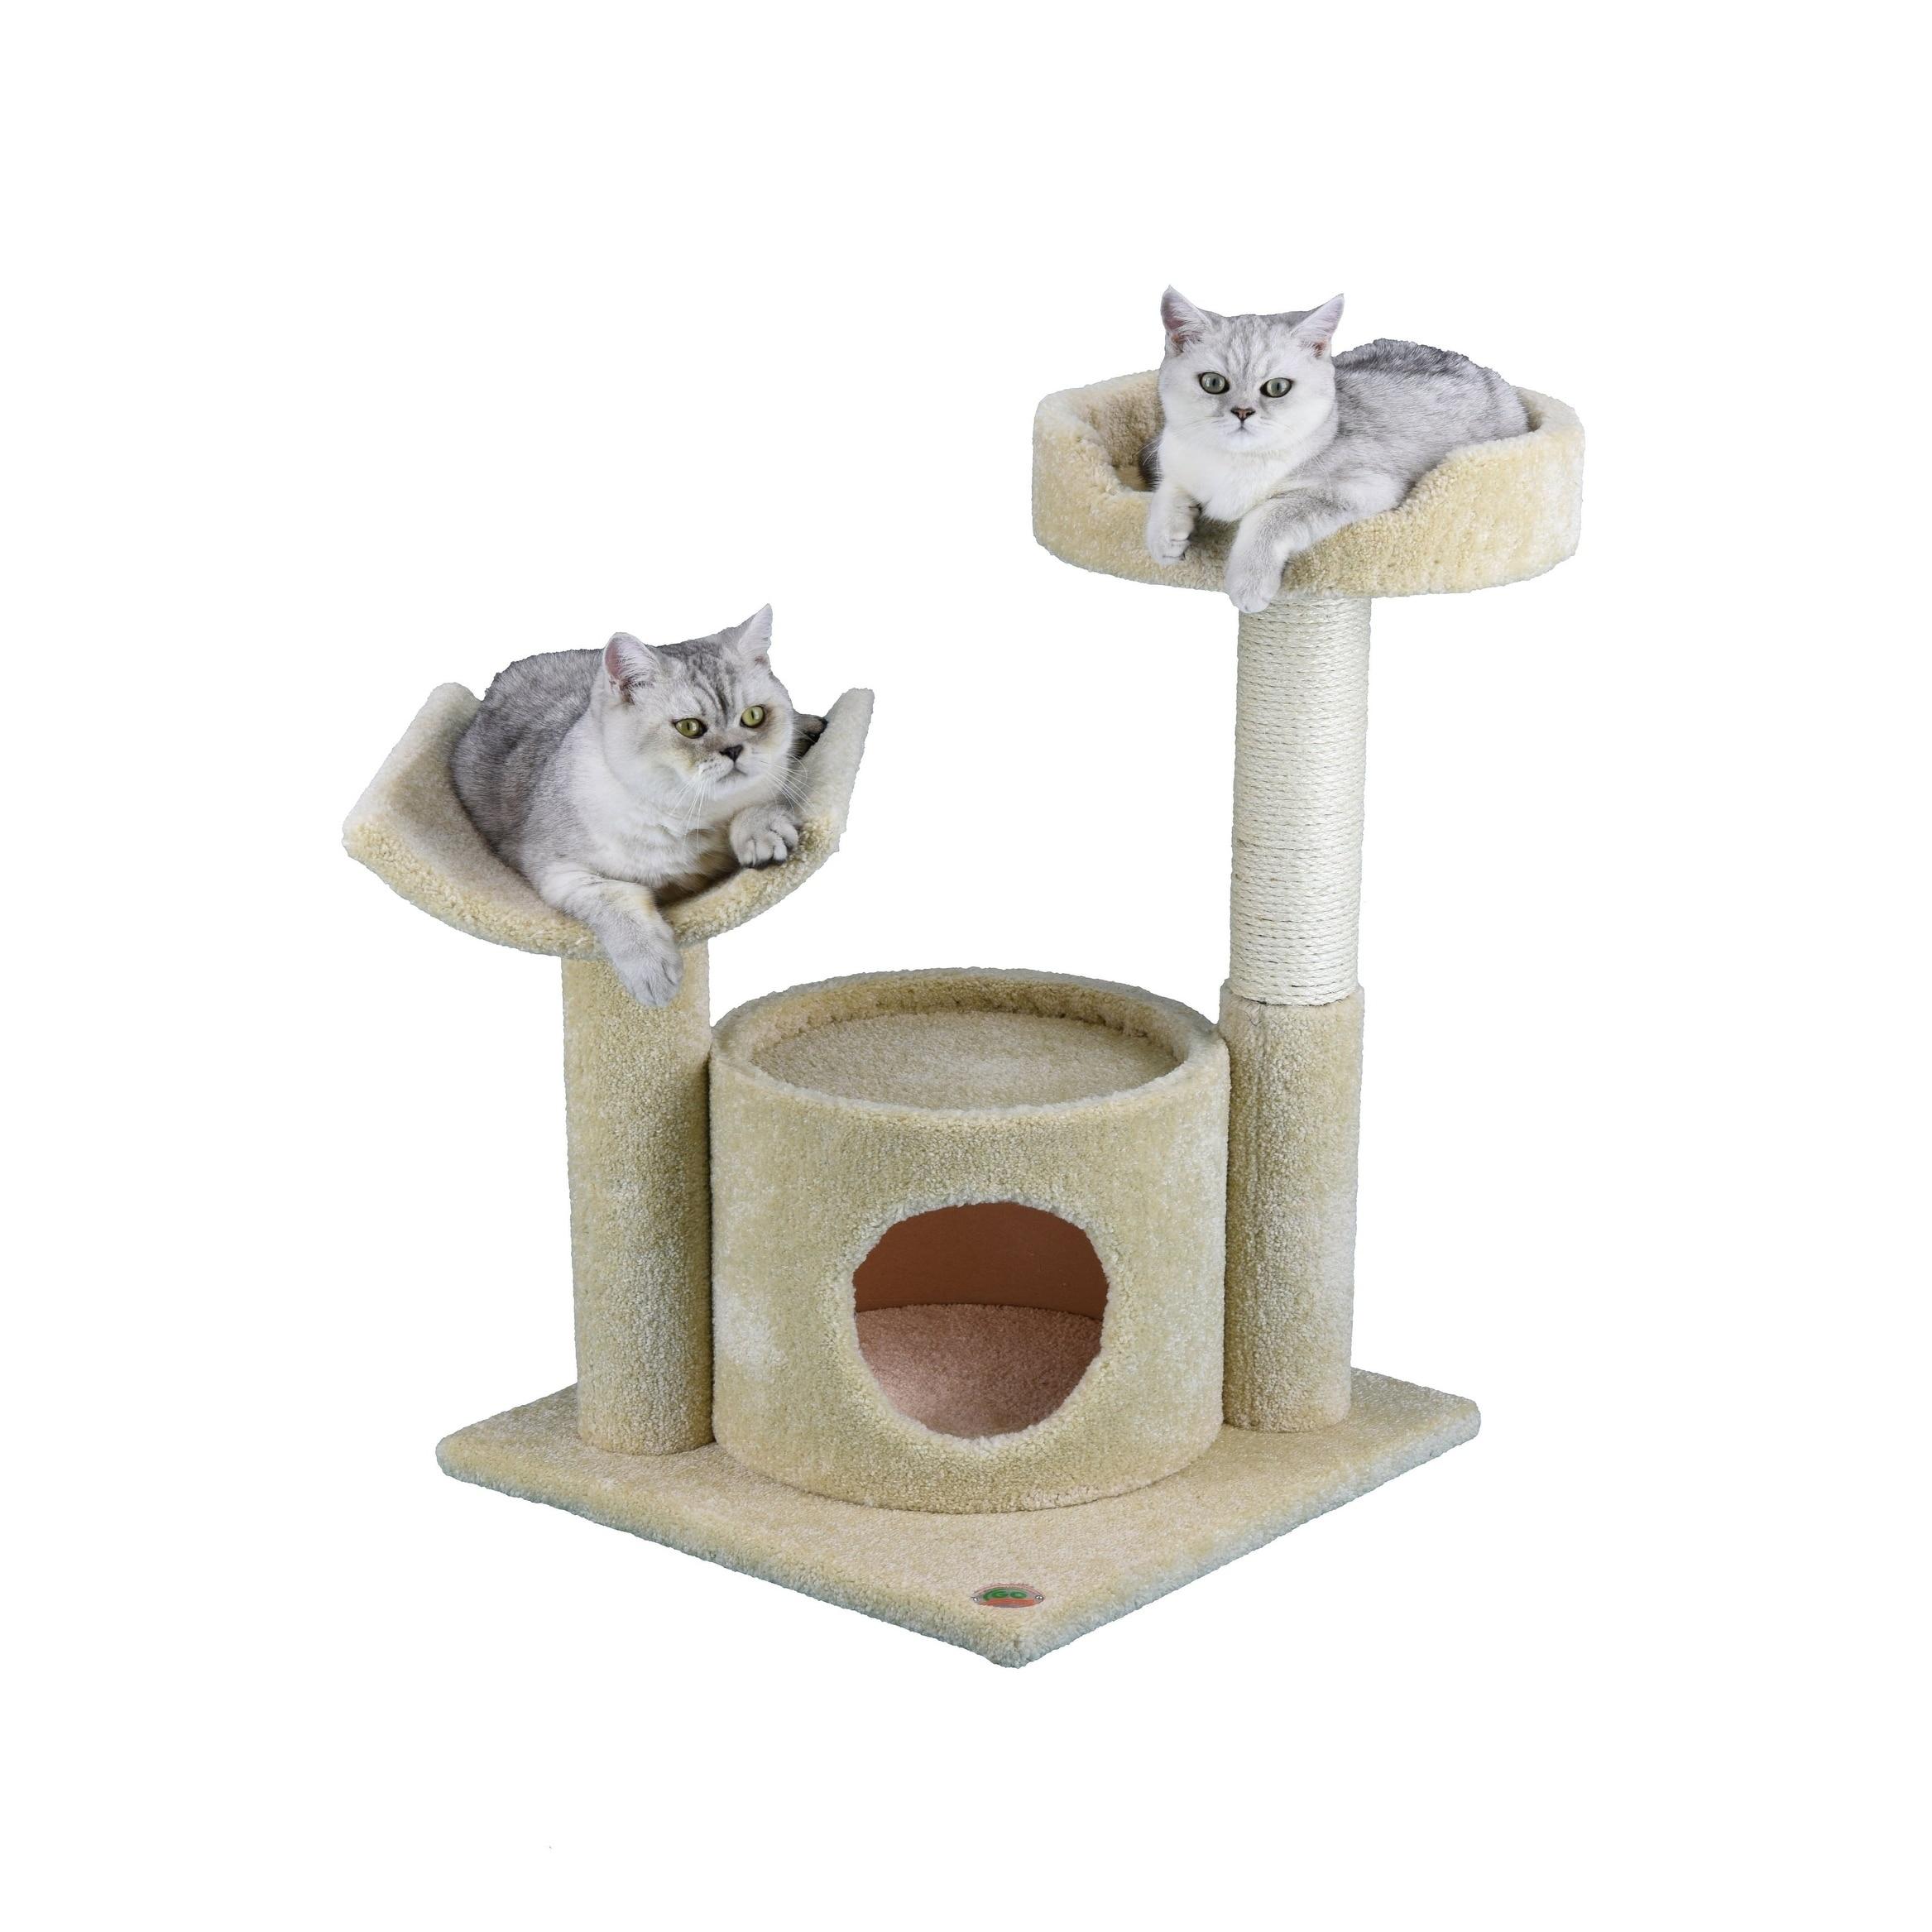 Go Pet Club 32 Inch Tall Premium Cat Tree Beige Overstock 12263355